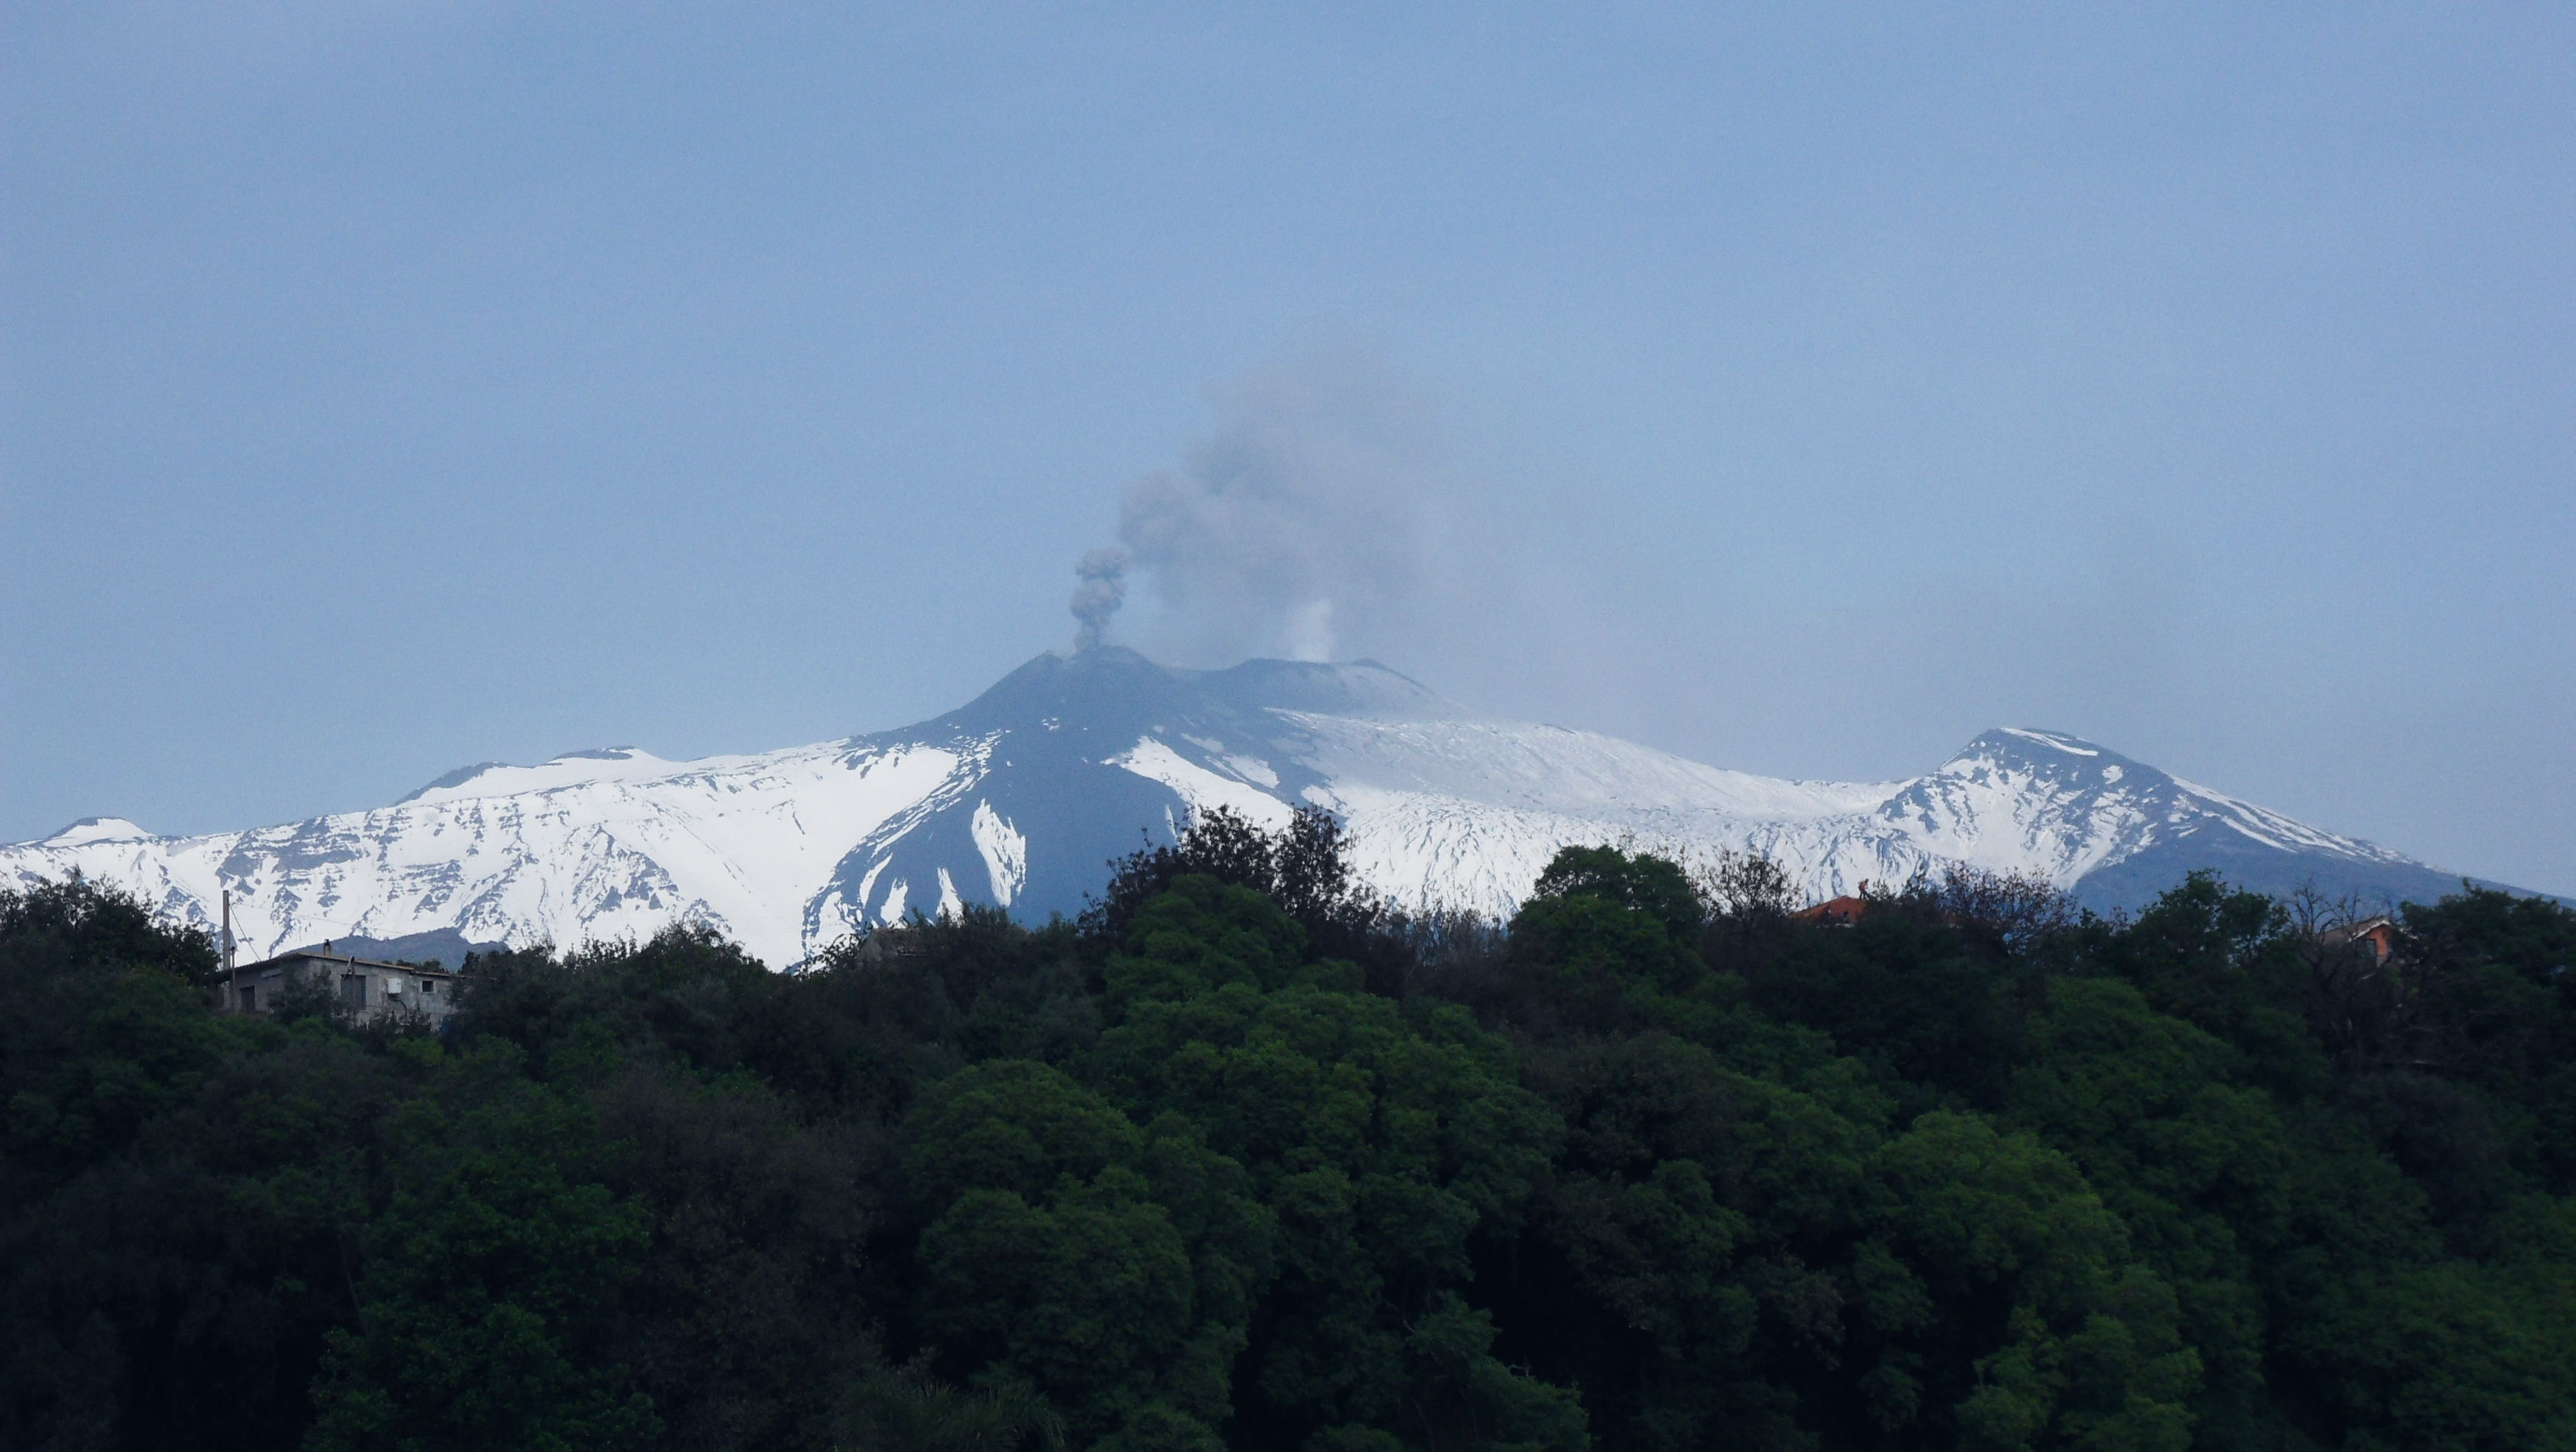 Etna Sicily most active vulcano Europe